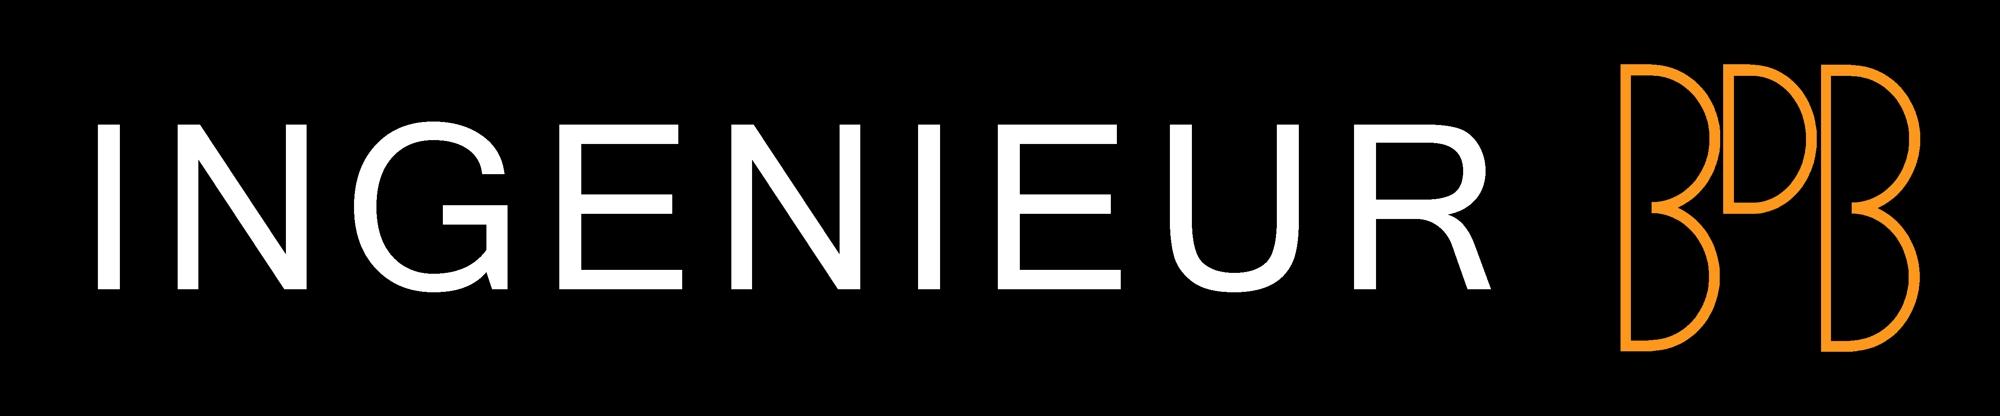 Logo Ingenieur BDB (schwarz ohne Rahmen, 2000x414)